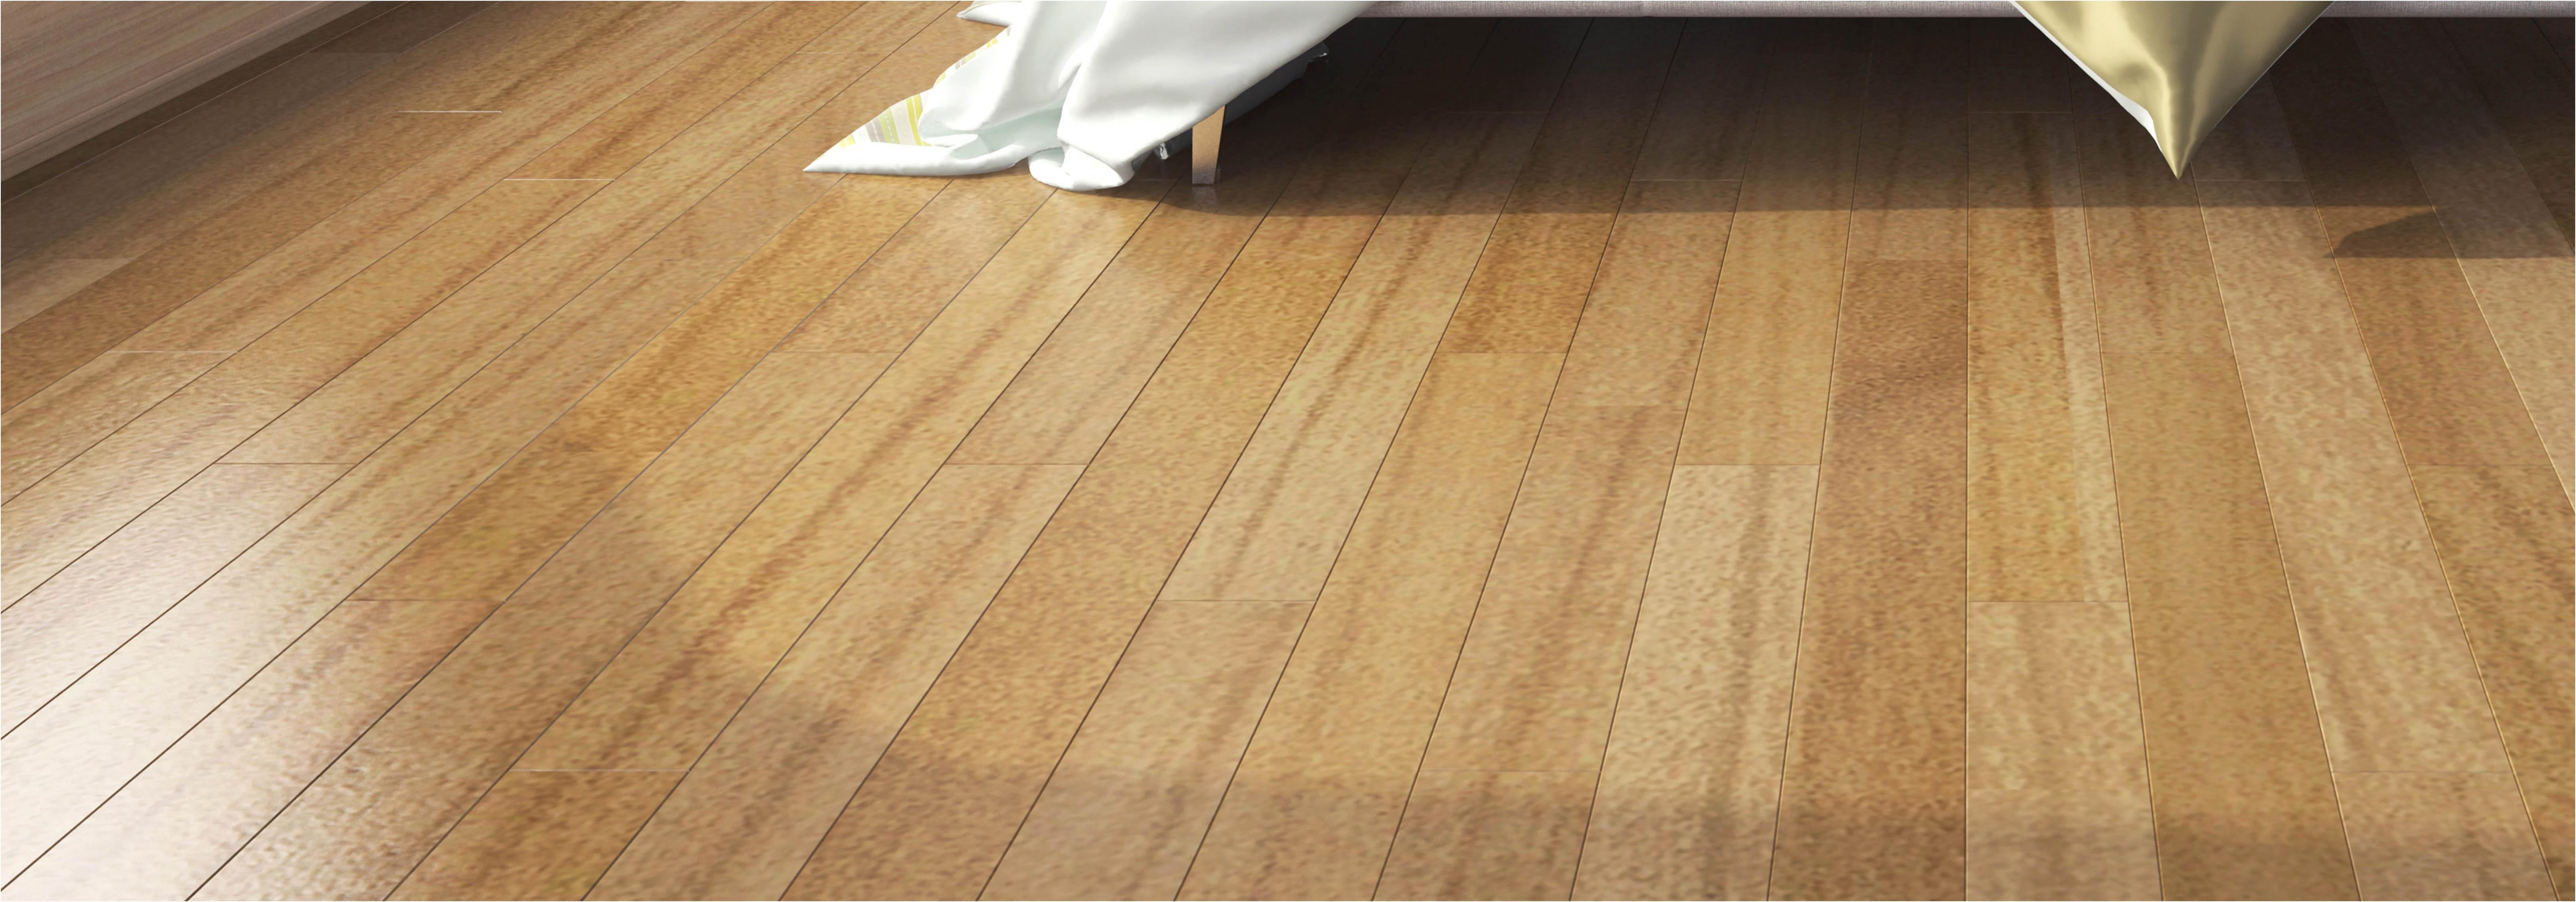 hardwood floor refinishing portland of how to make wood flooring fresh refinish done in portland oregon inside how to make wood flooring elegant hardwood and laminate flooring of how to make wood flooring